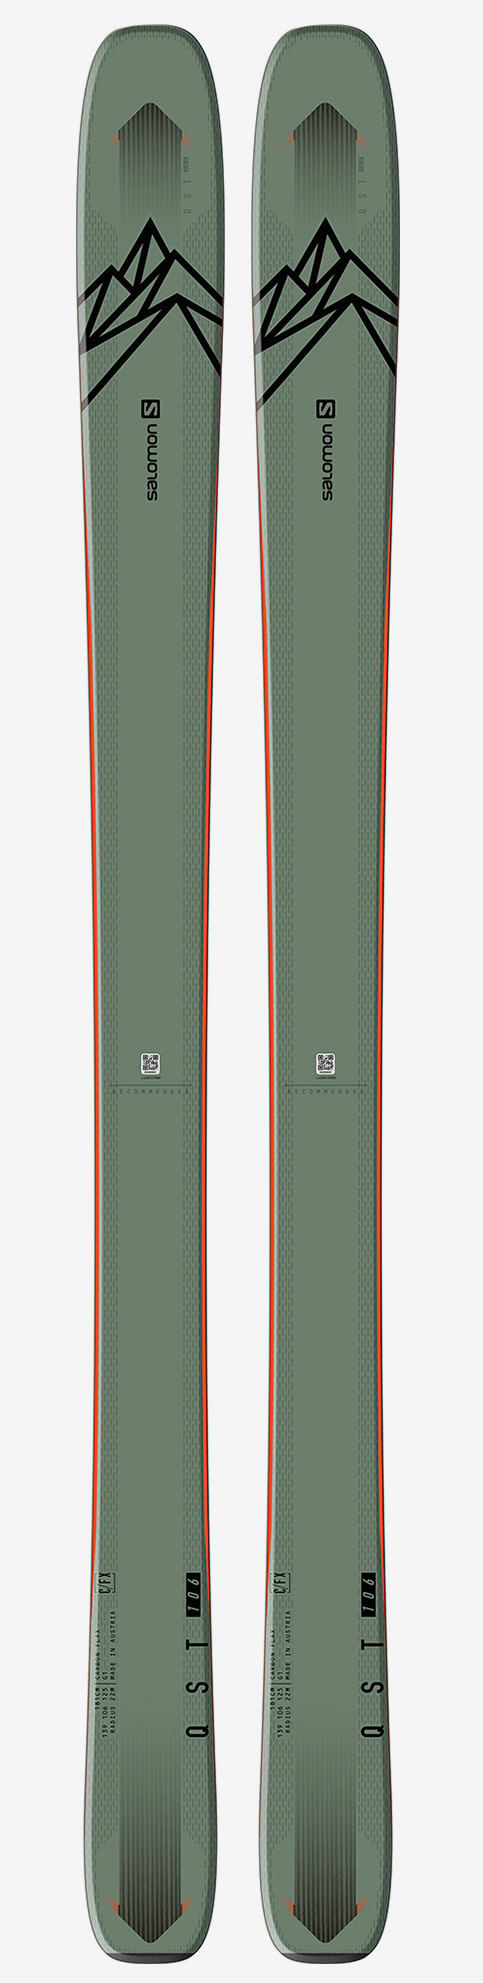 Salomon-QST-106-Skis-2021